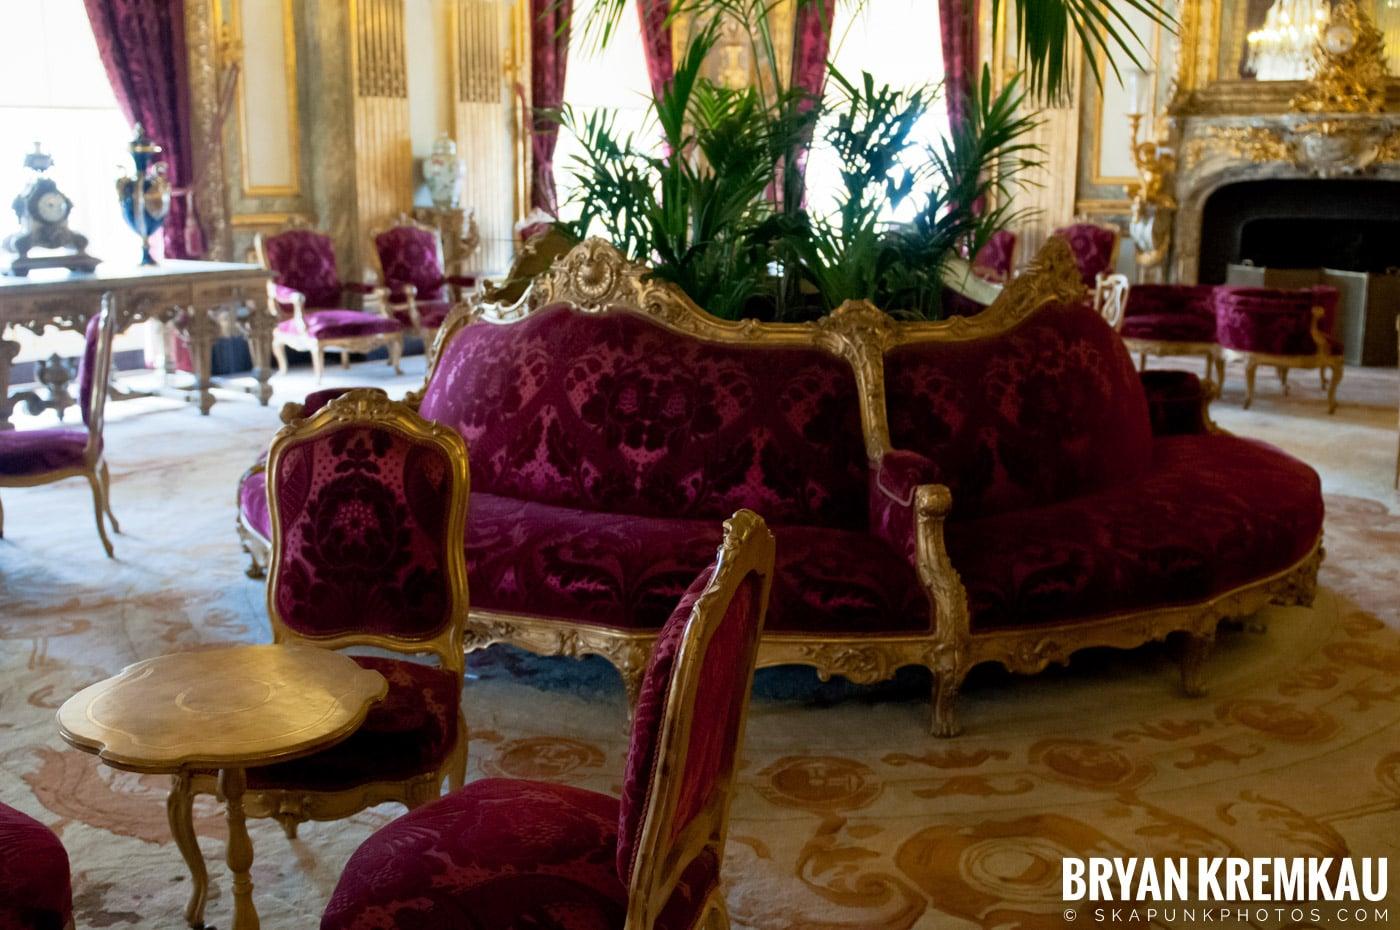 Paris, France Honeymoon - Day 3 - 7.20.11 (64)